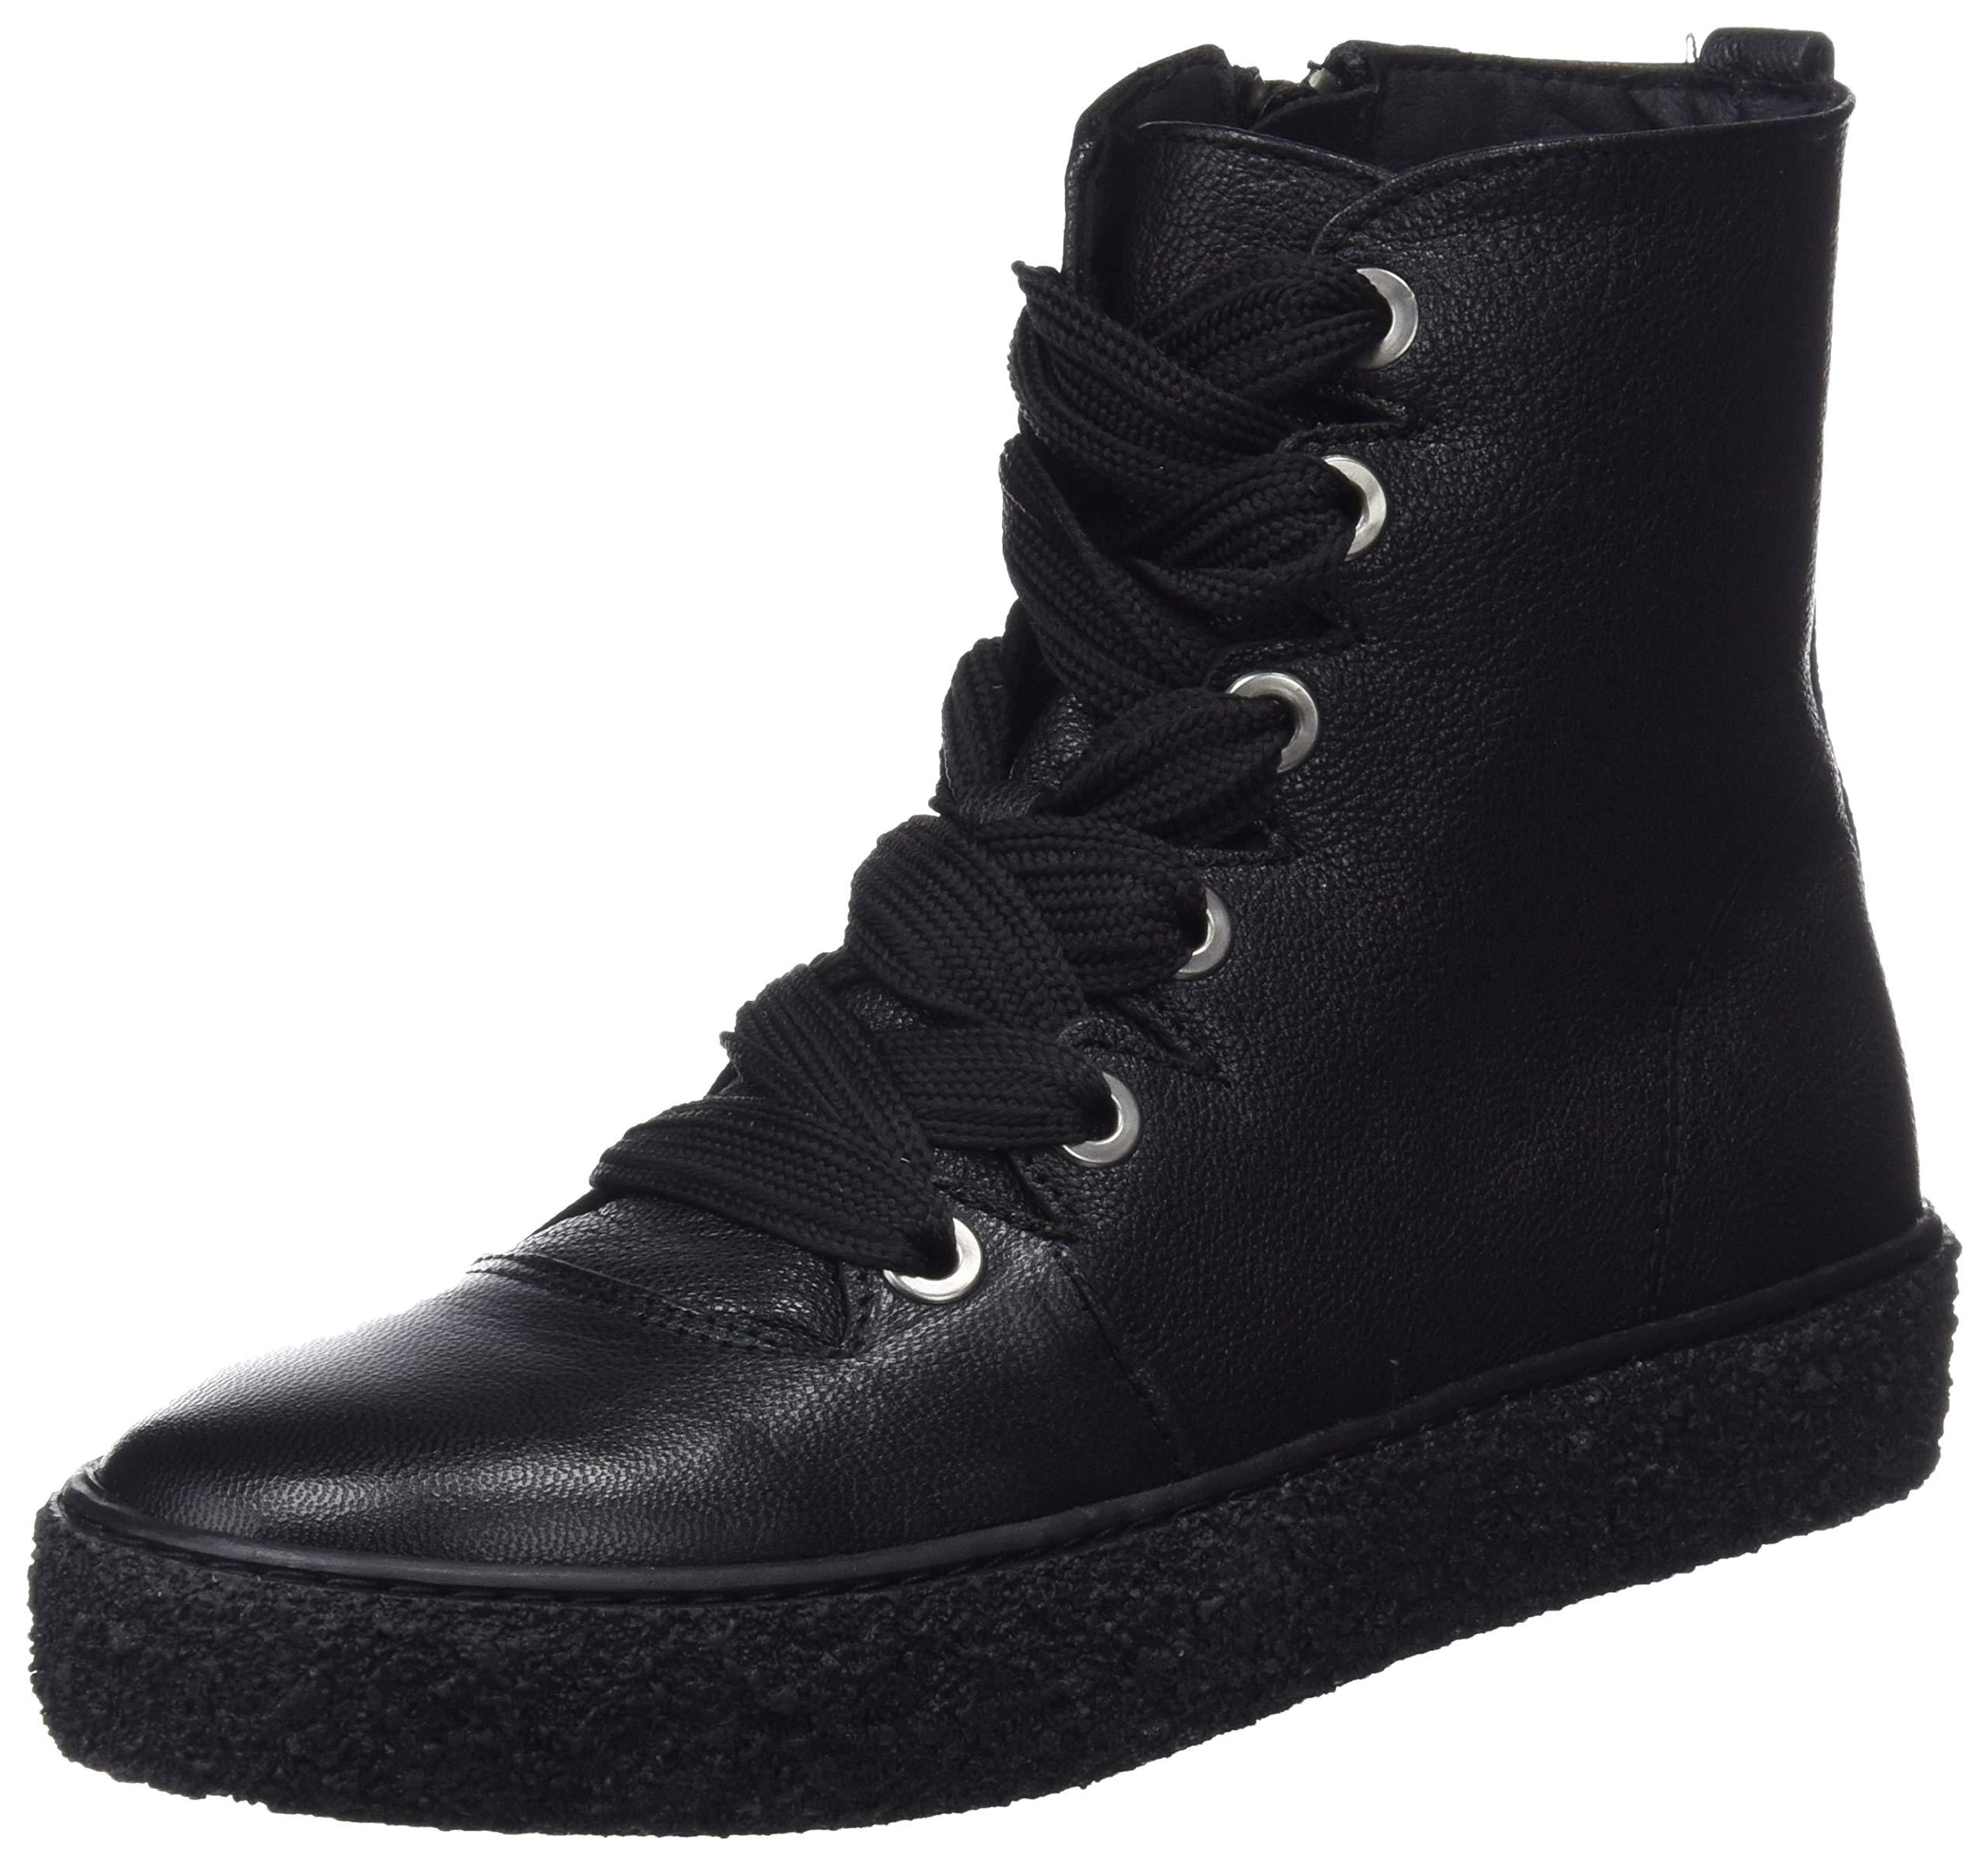 Eu FemmeNoirblack 00139 Mamatayoe Leather WendyChaussons Real Montants ulcF5K1J3T